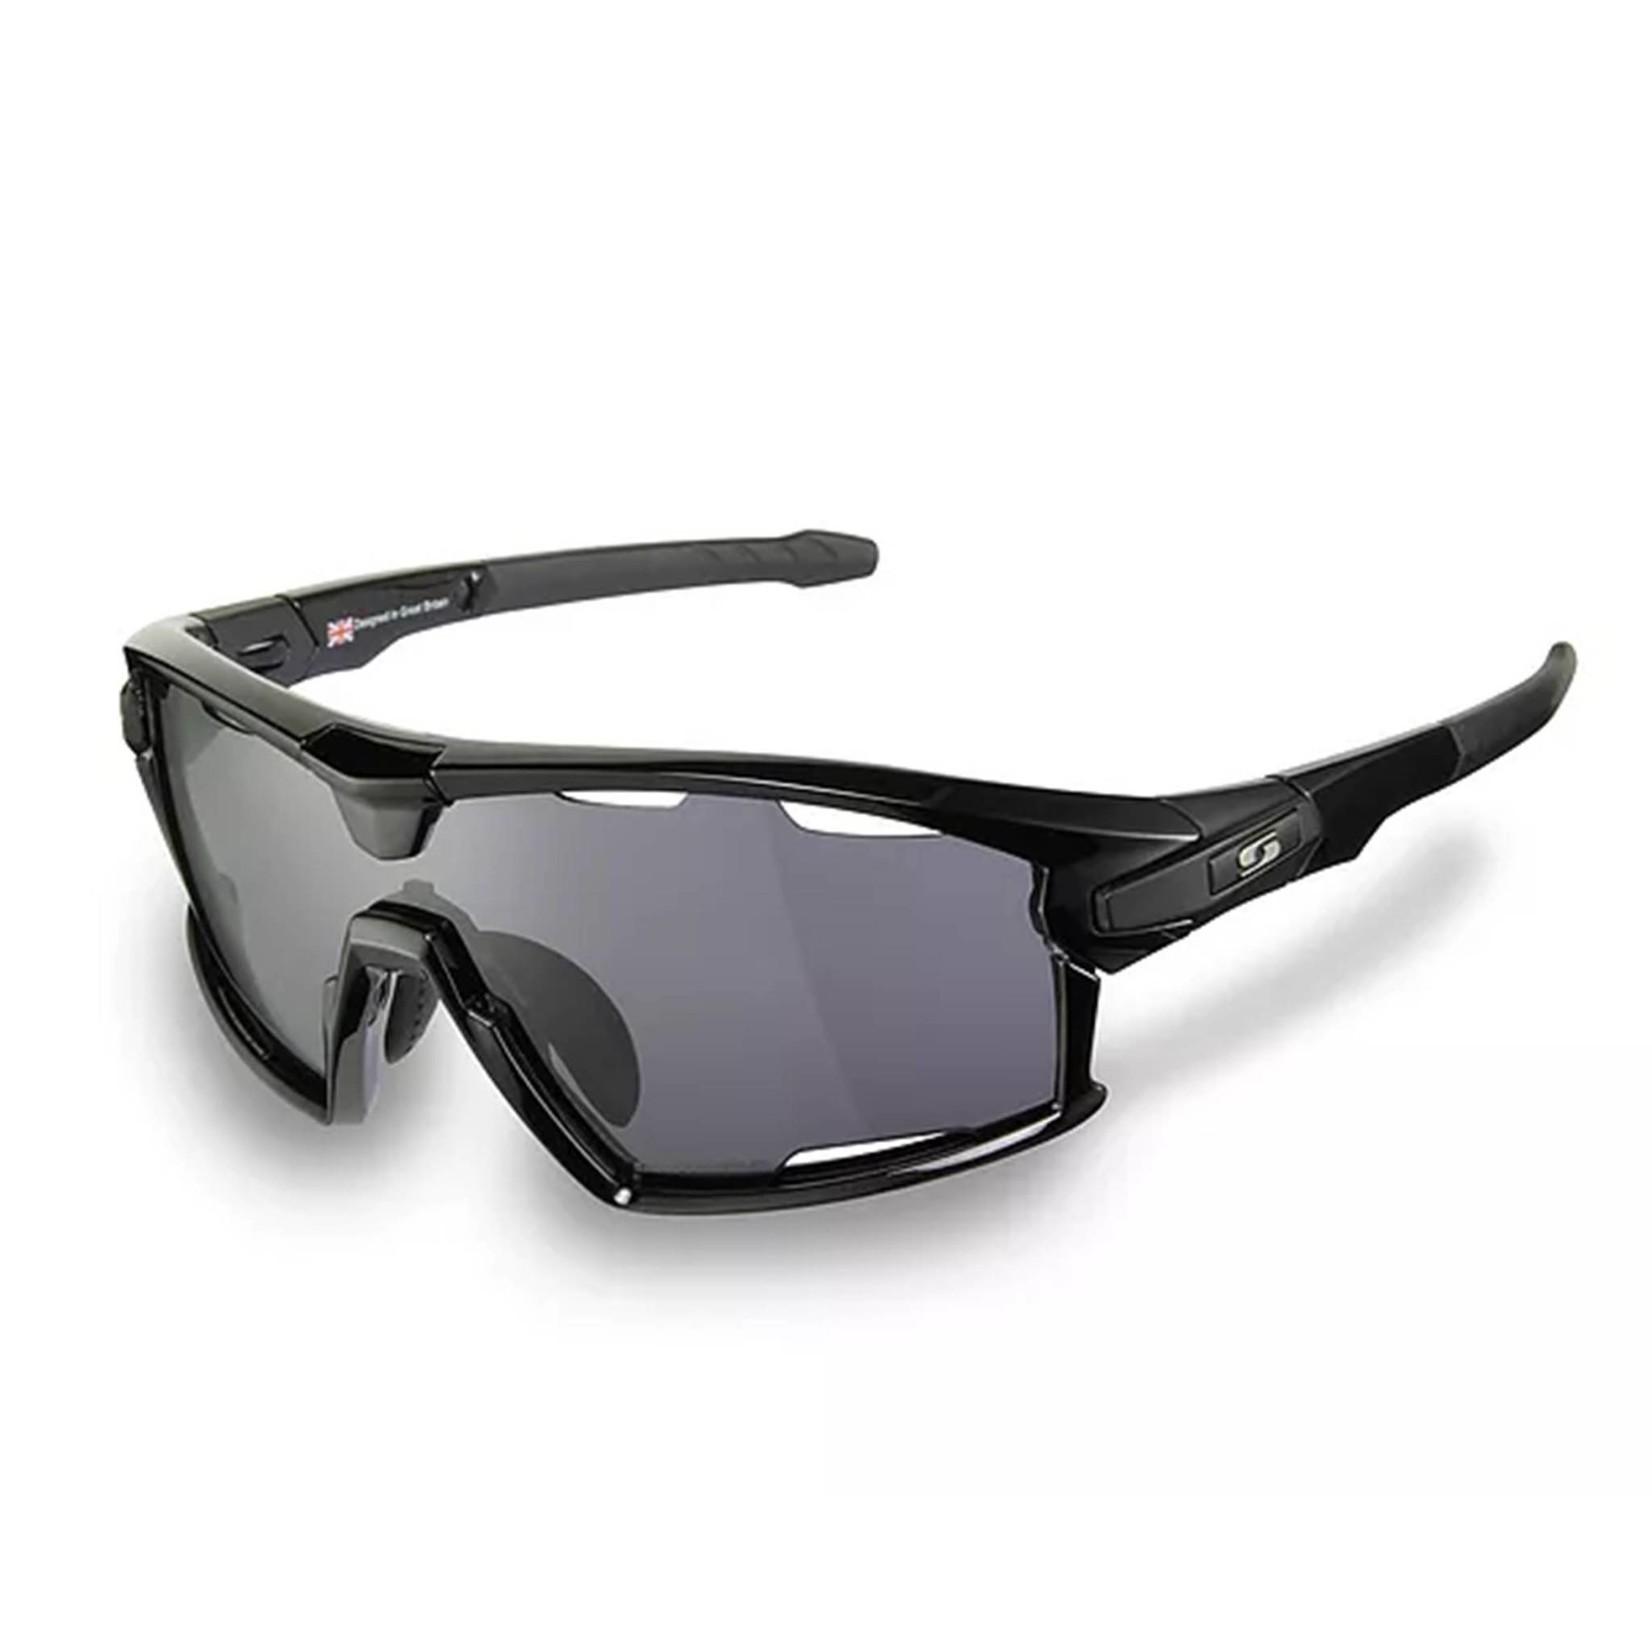 Sunwise Hybrid Air Chrome Sunglasses Black